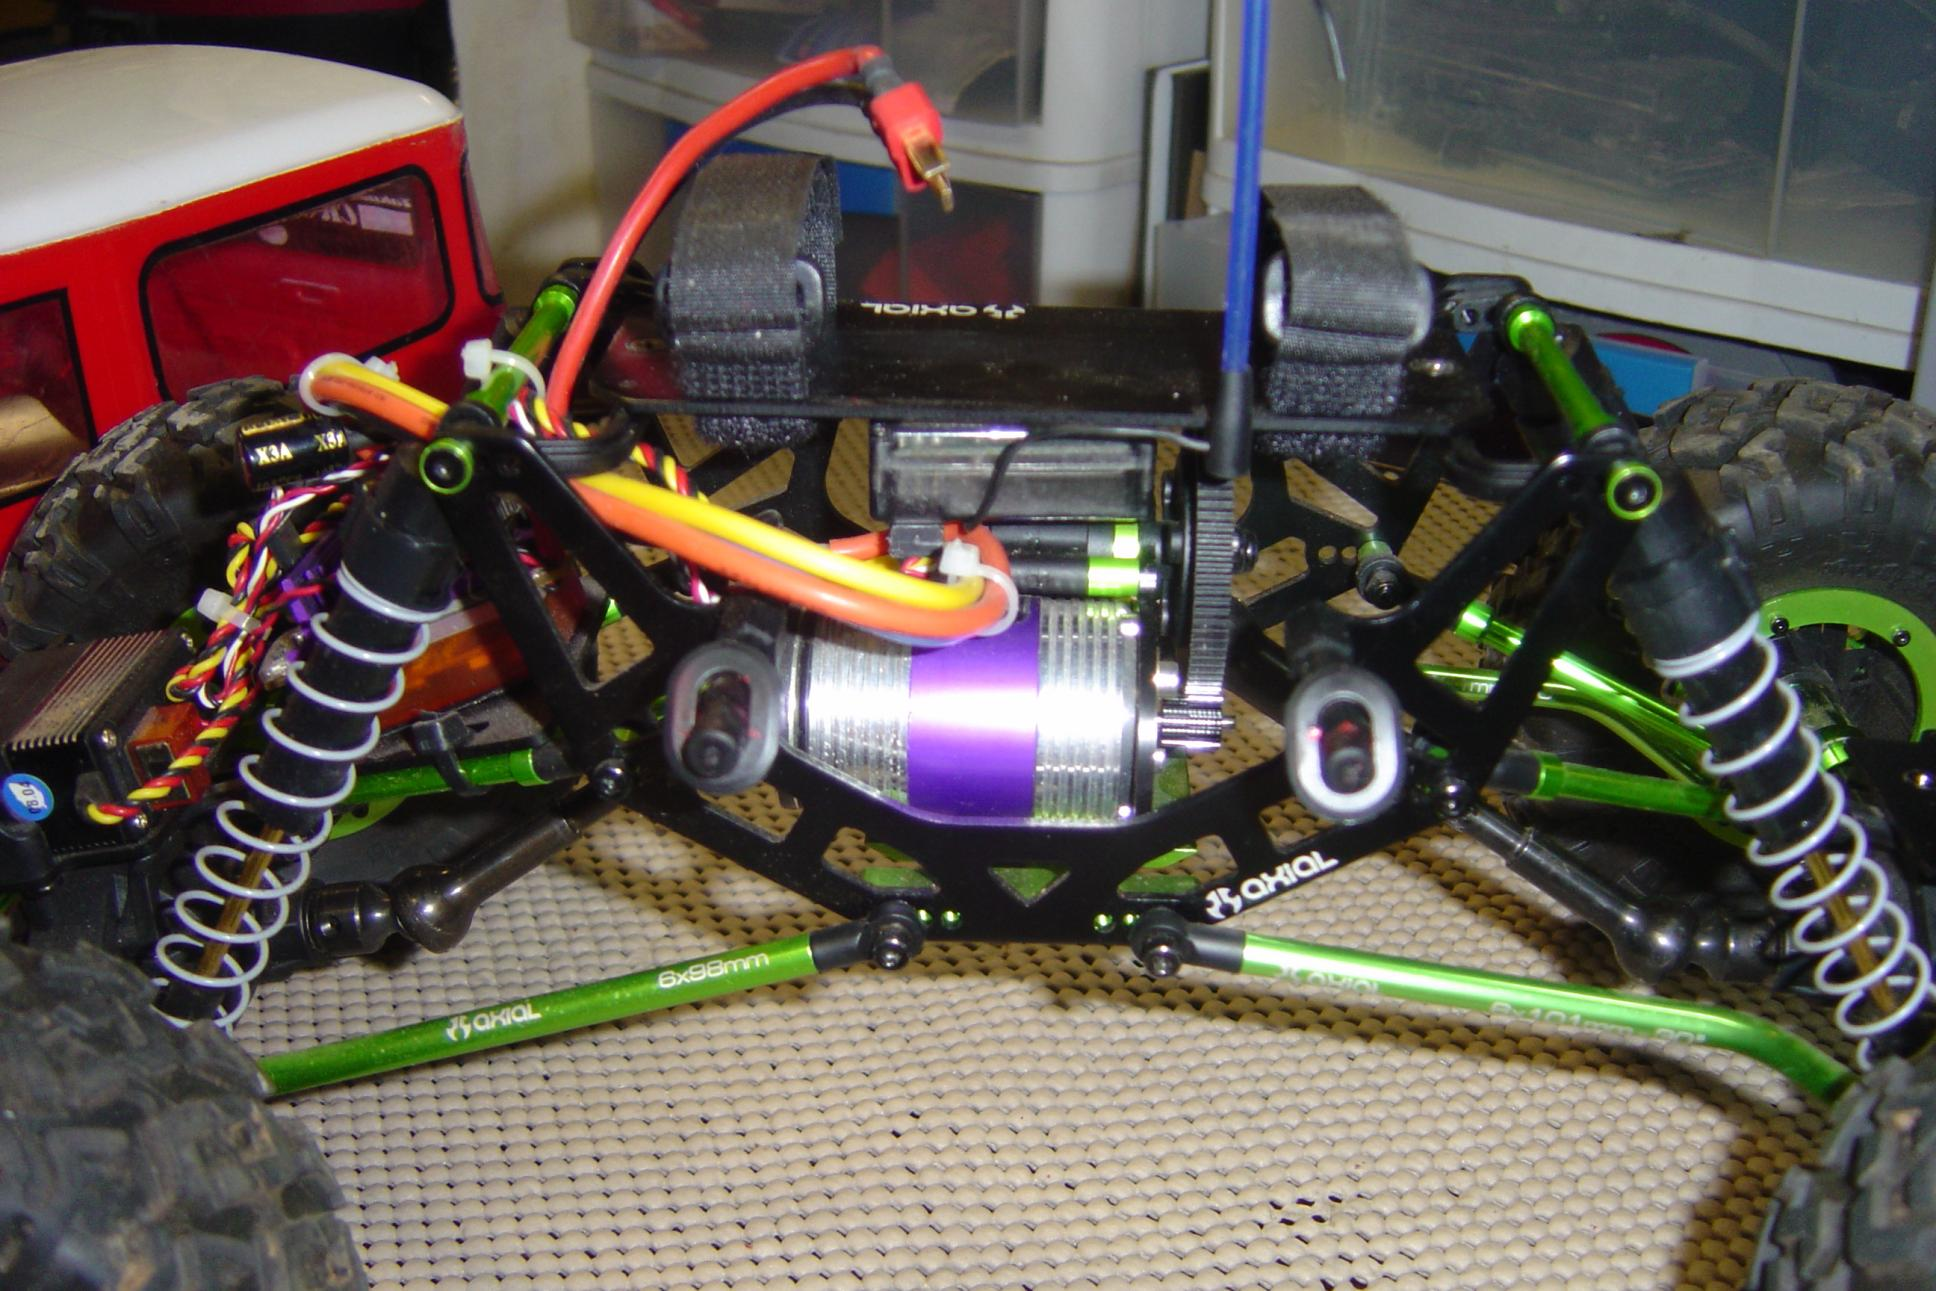 Axial AX10 Crawler, STRC, Novak Goat Brushless, Hitec ...